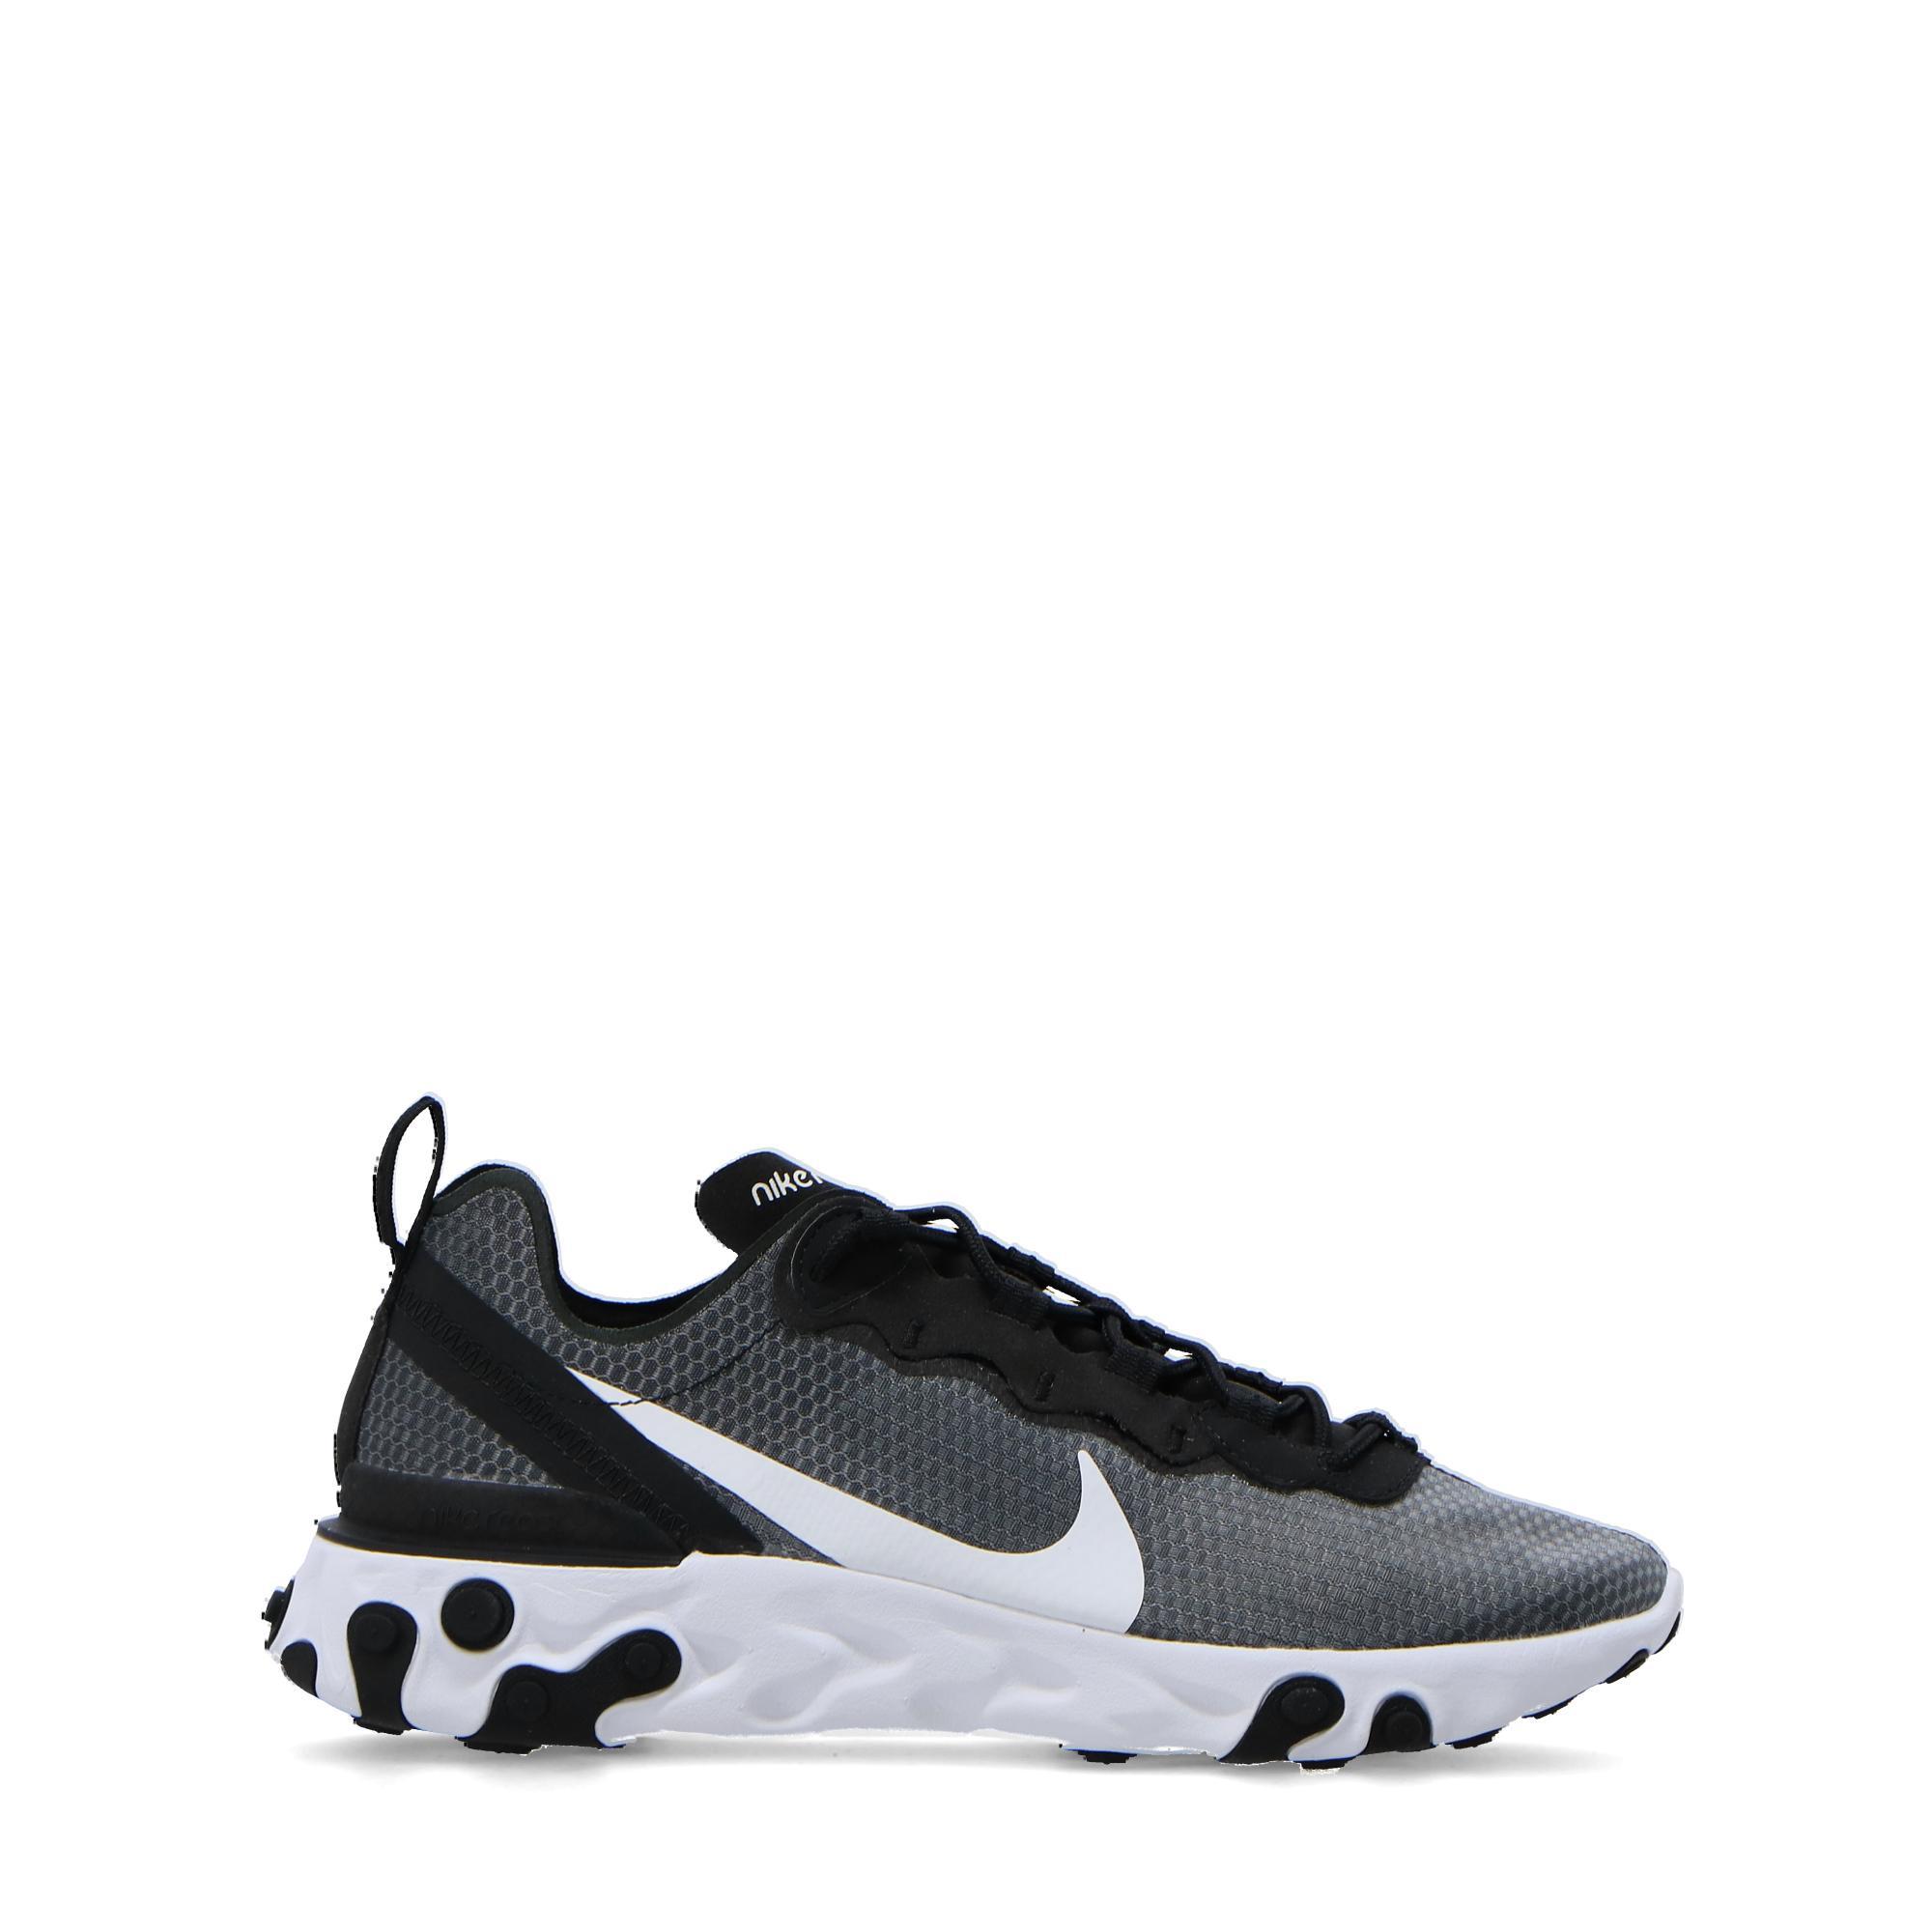 Nike React Element 55 shoes white